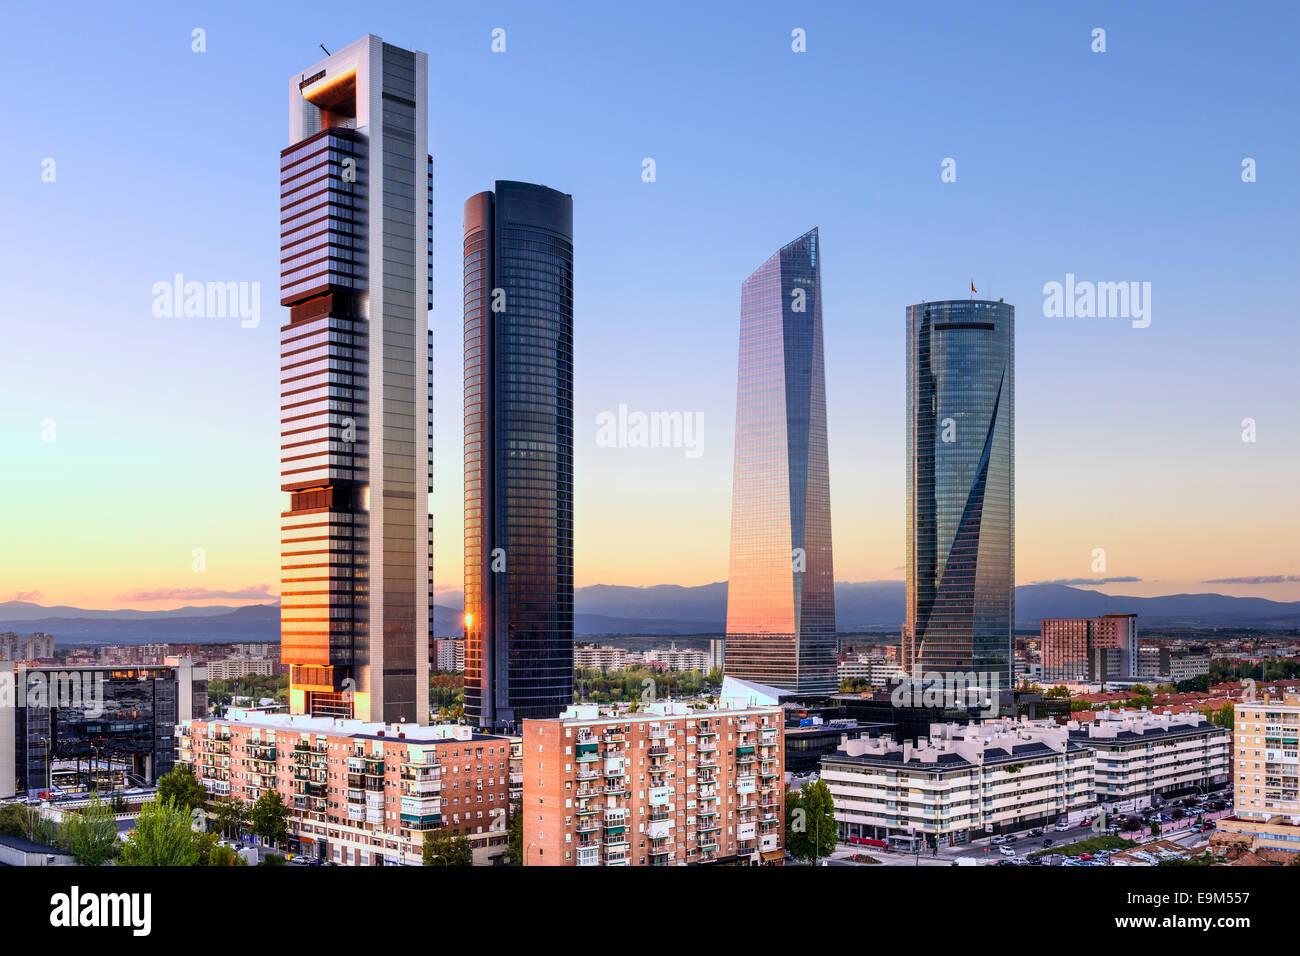 Madrid, España distrito financiero skyline al atardecer. Imagen De Stock